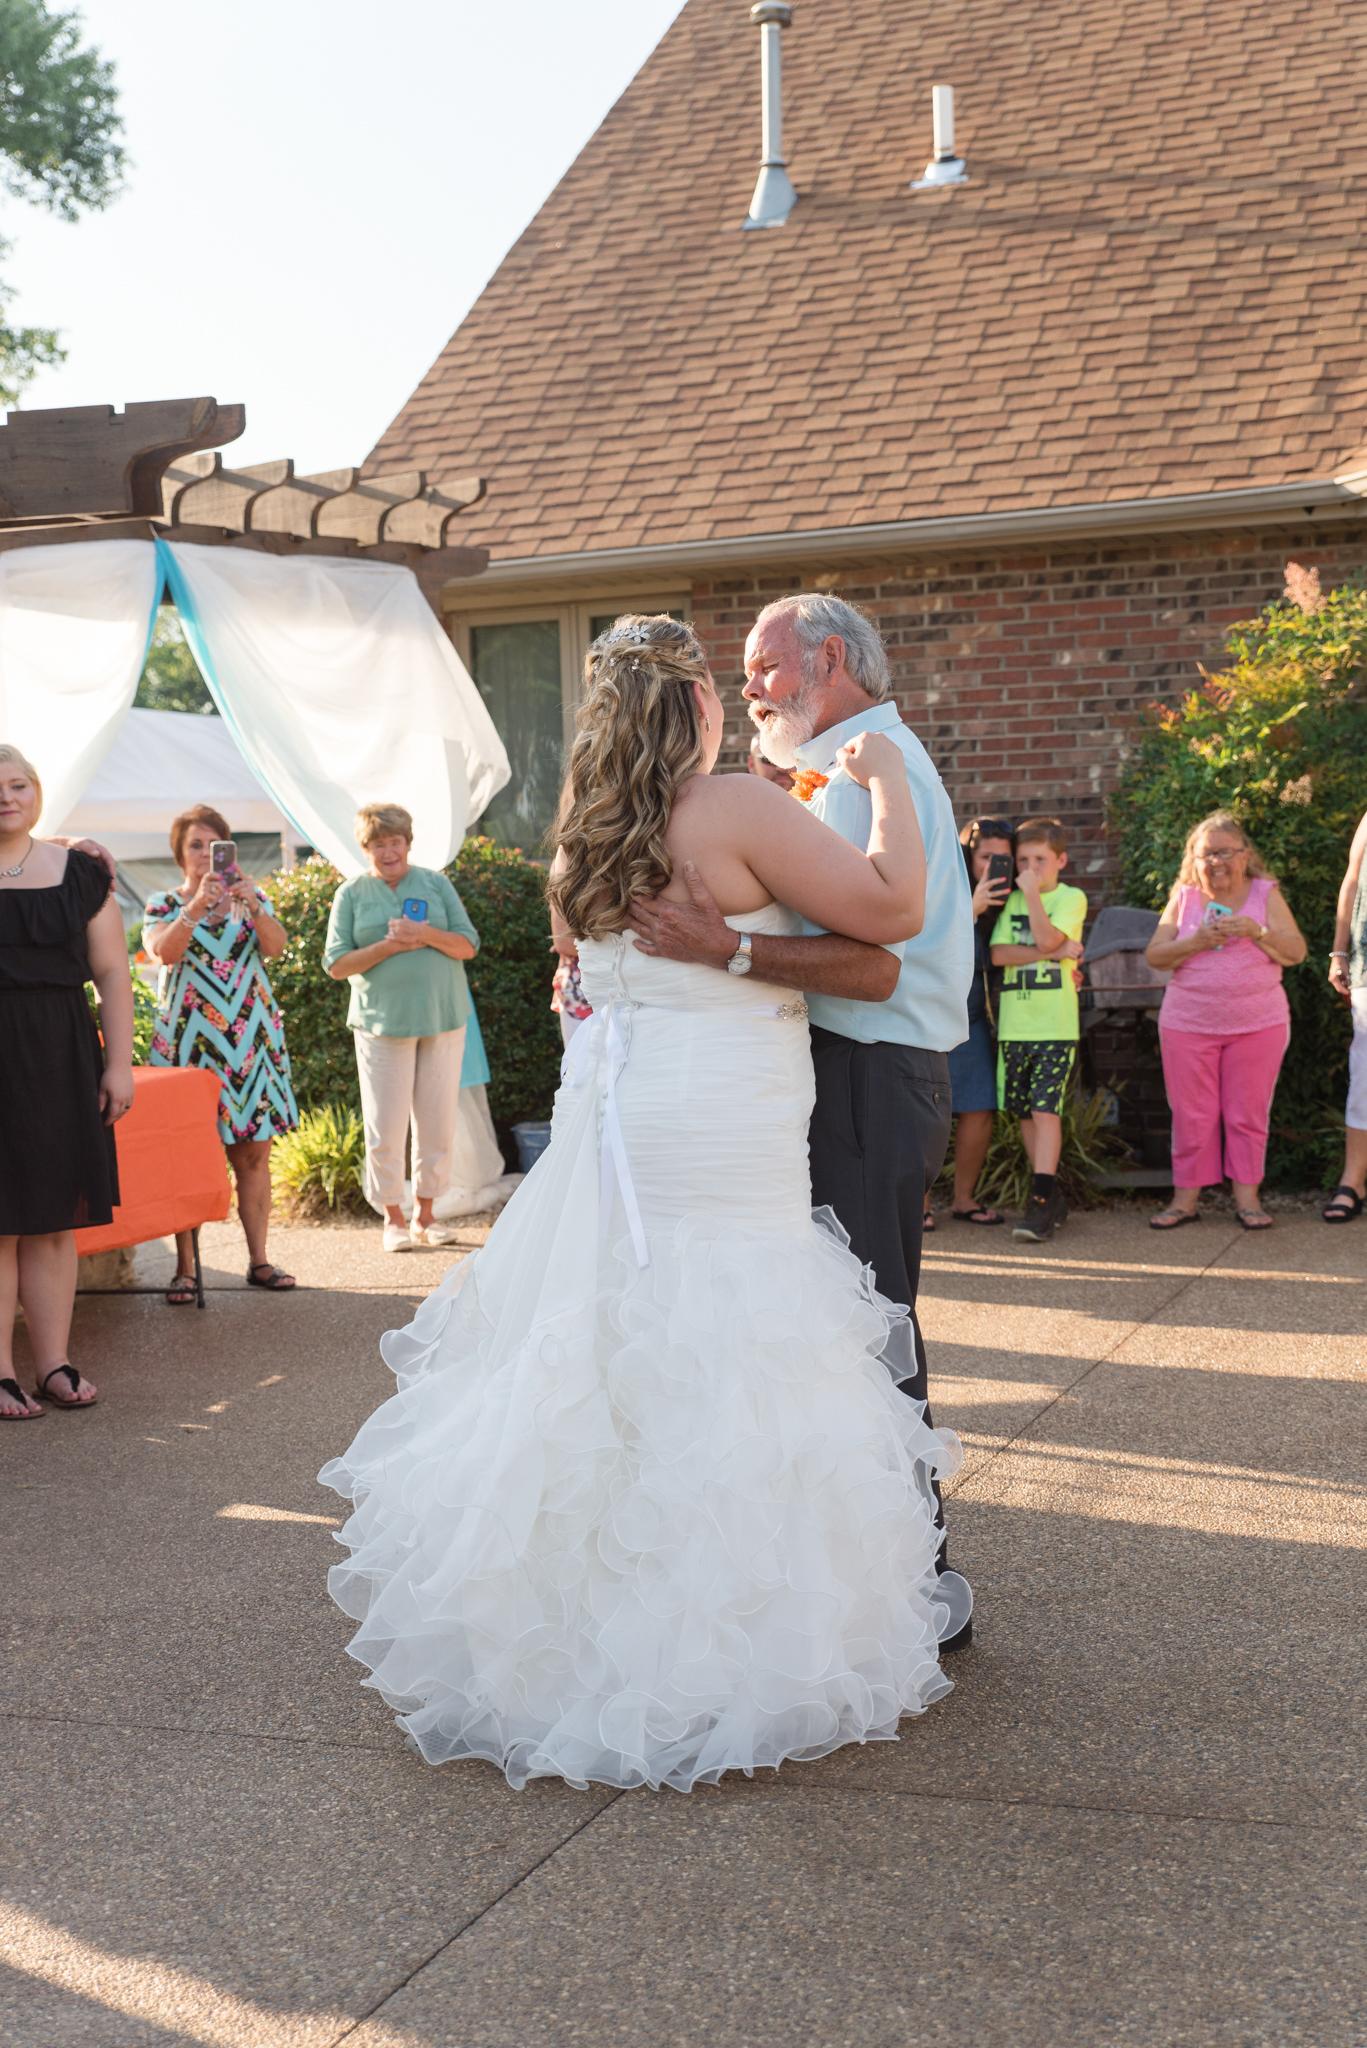 Dry Ridge KY, Dry Ridge KY photographer, Dry Ridge KY outdoor wedding, ky bride, ky wedding